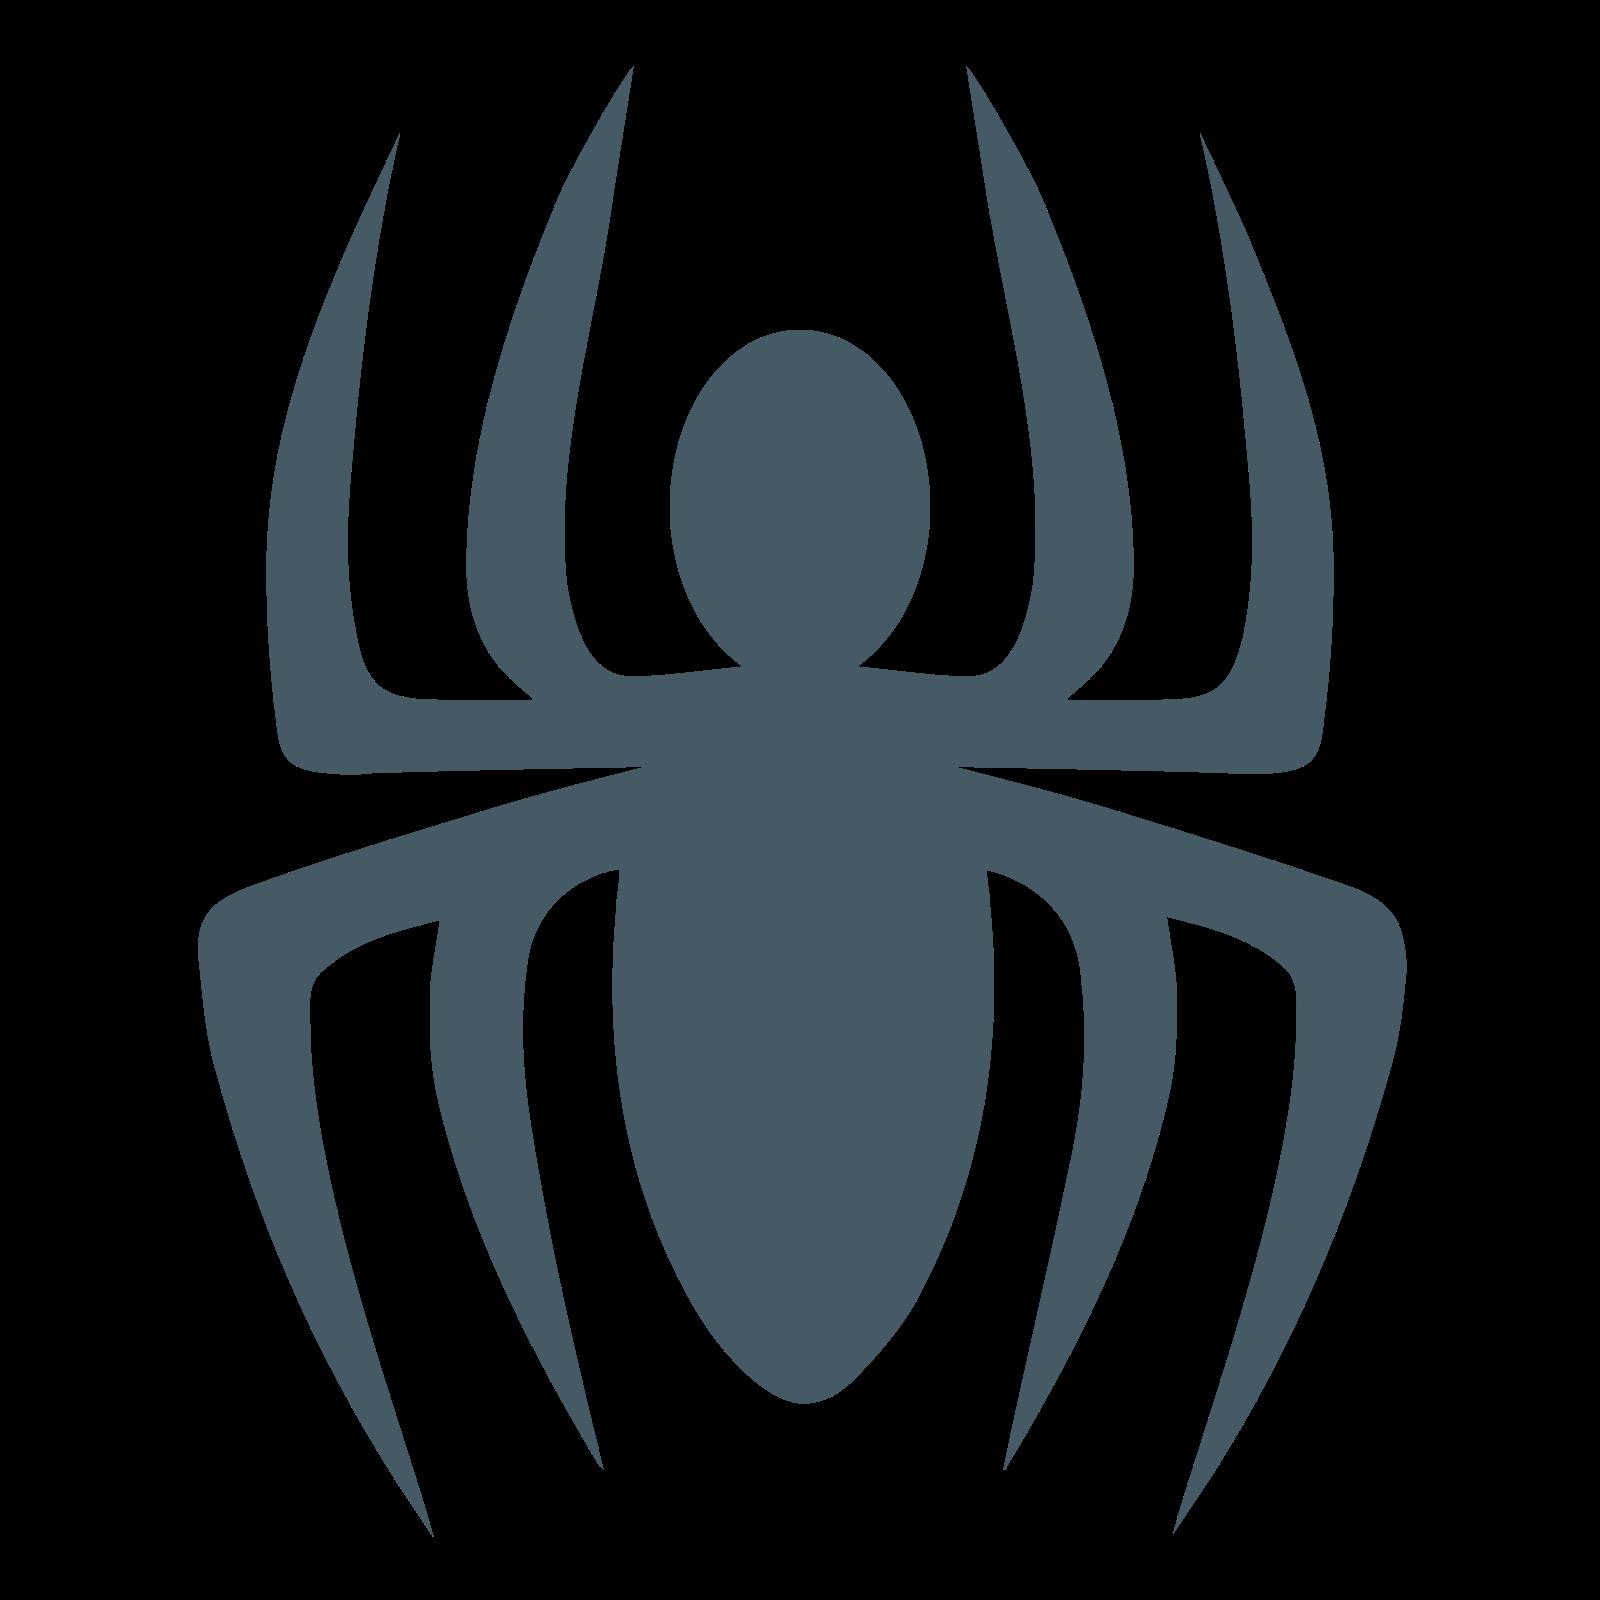 Spider-Man Stary icon